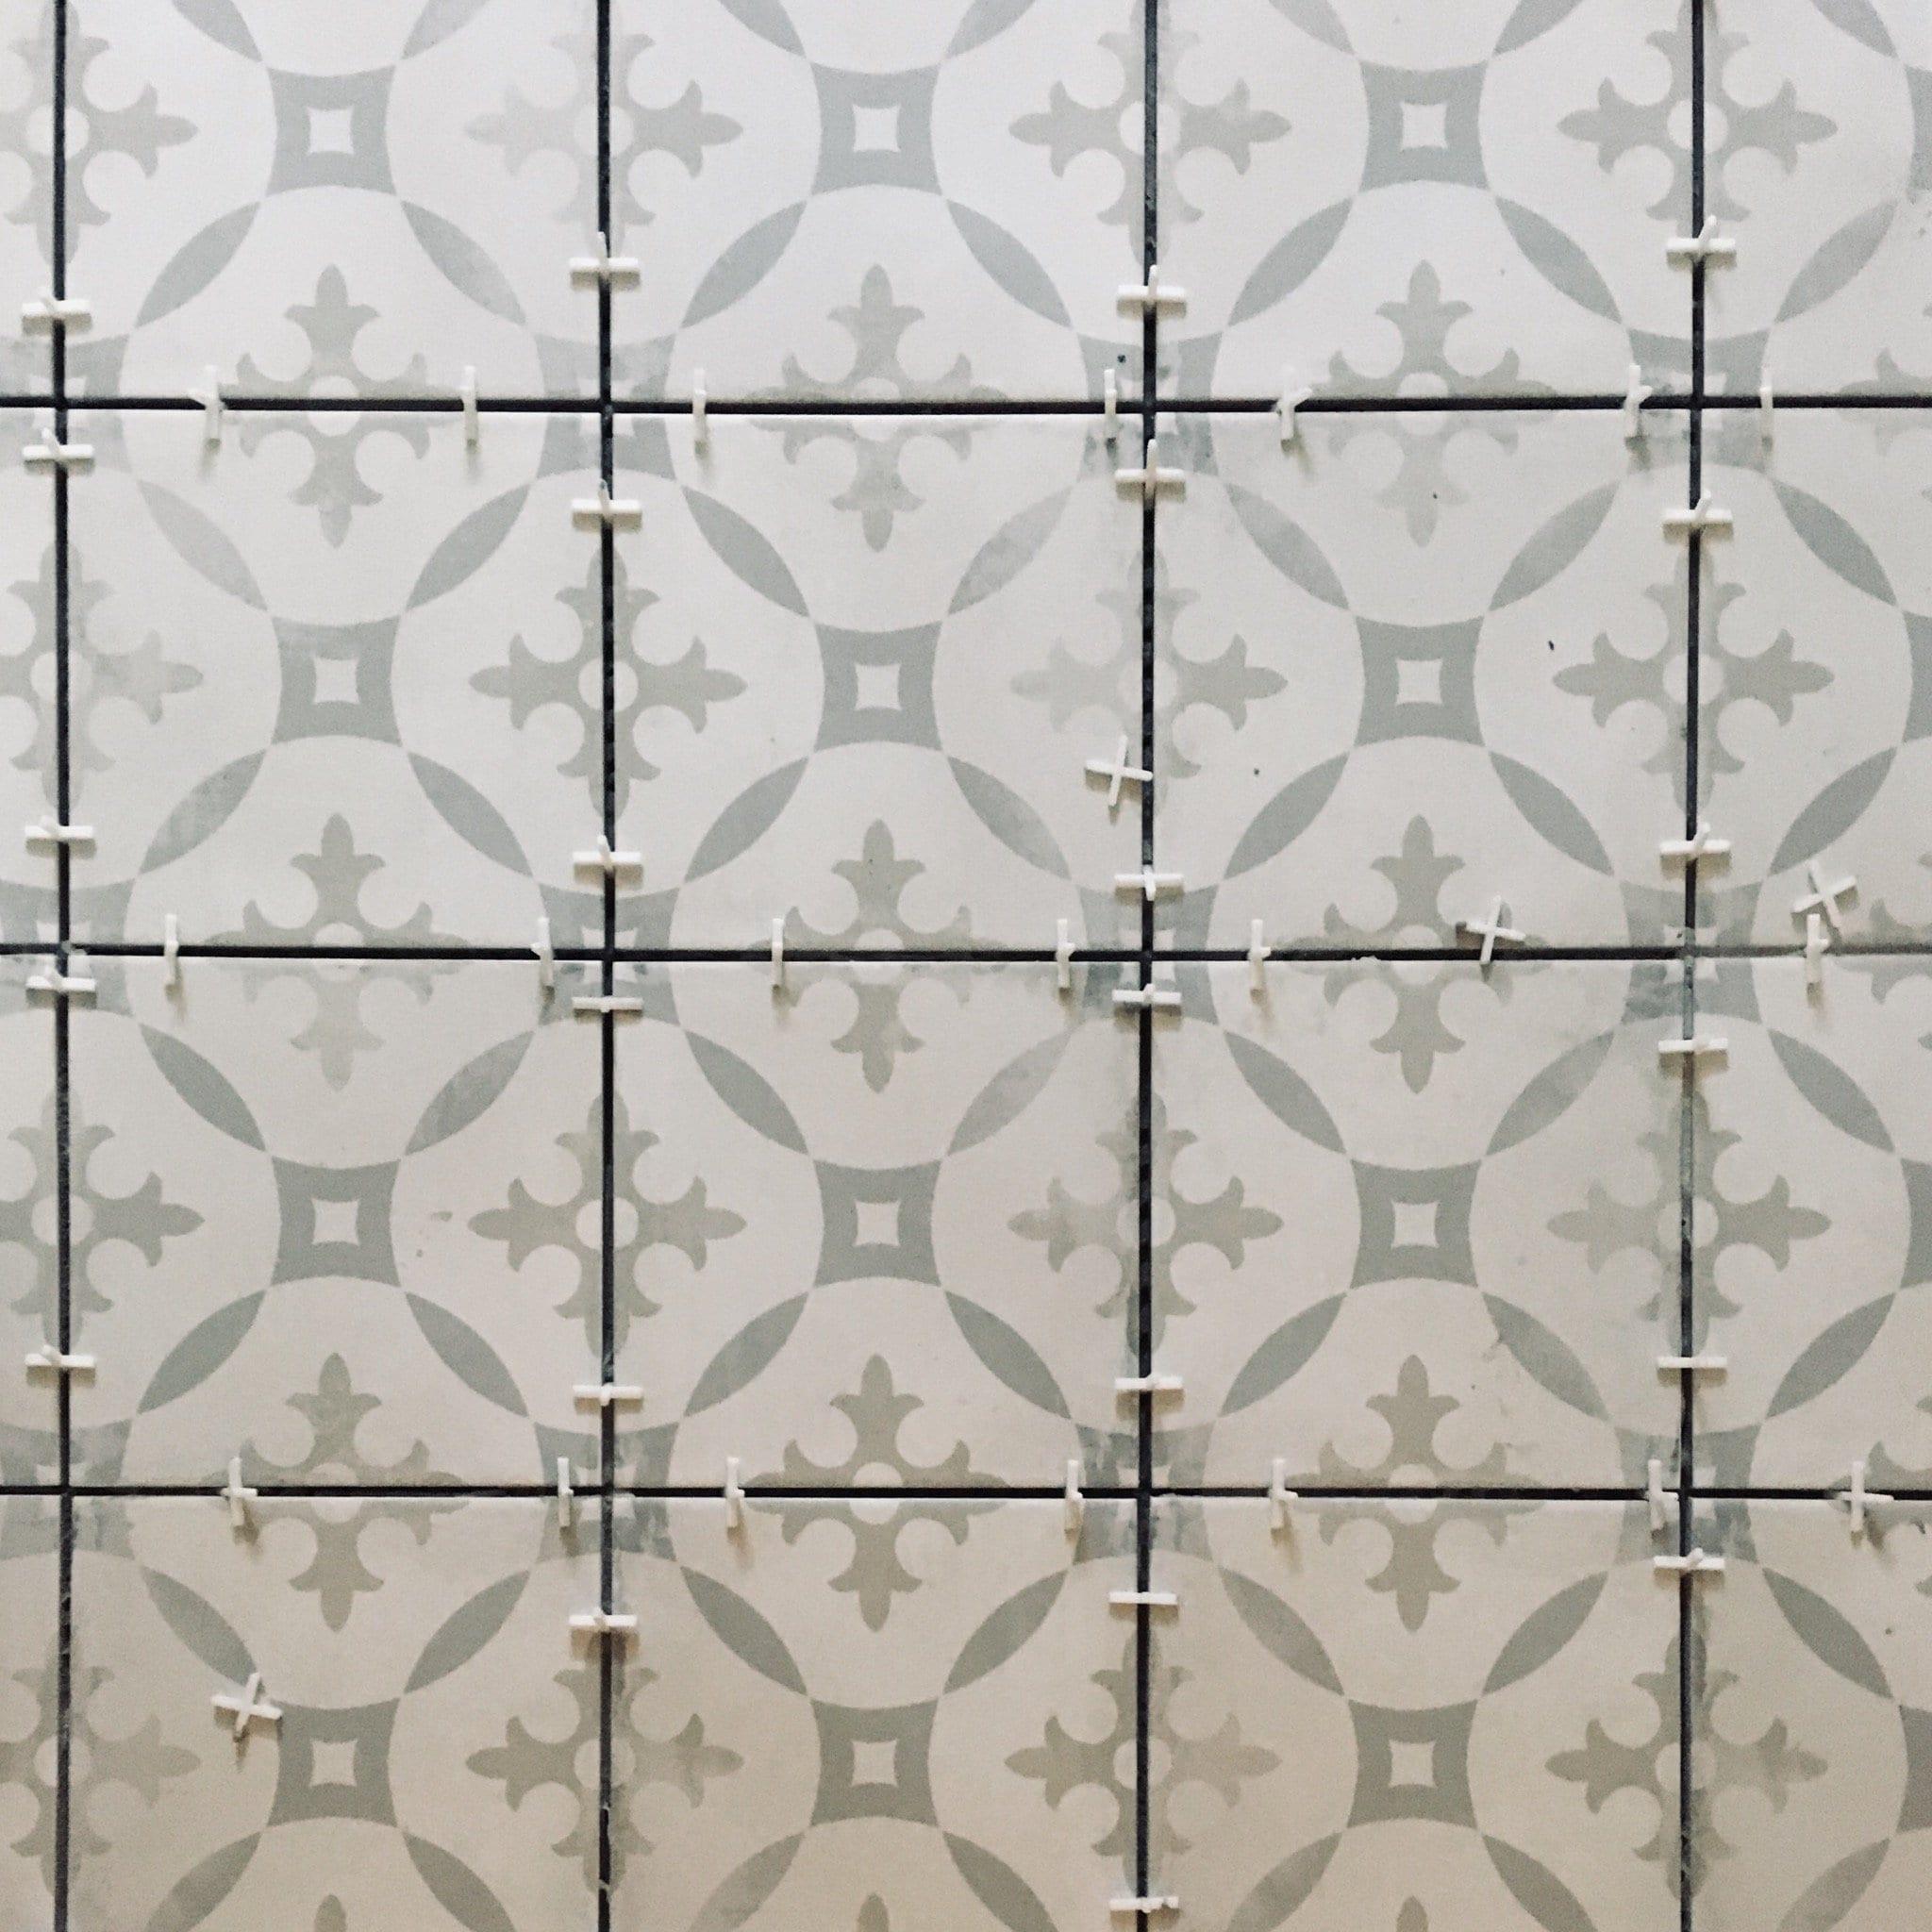 Laundry Room Floor Tile